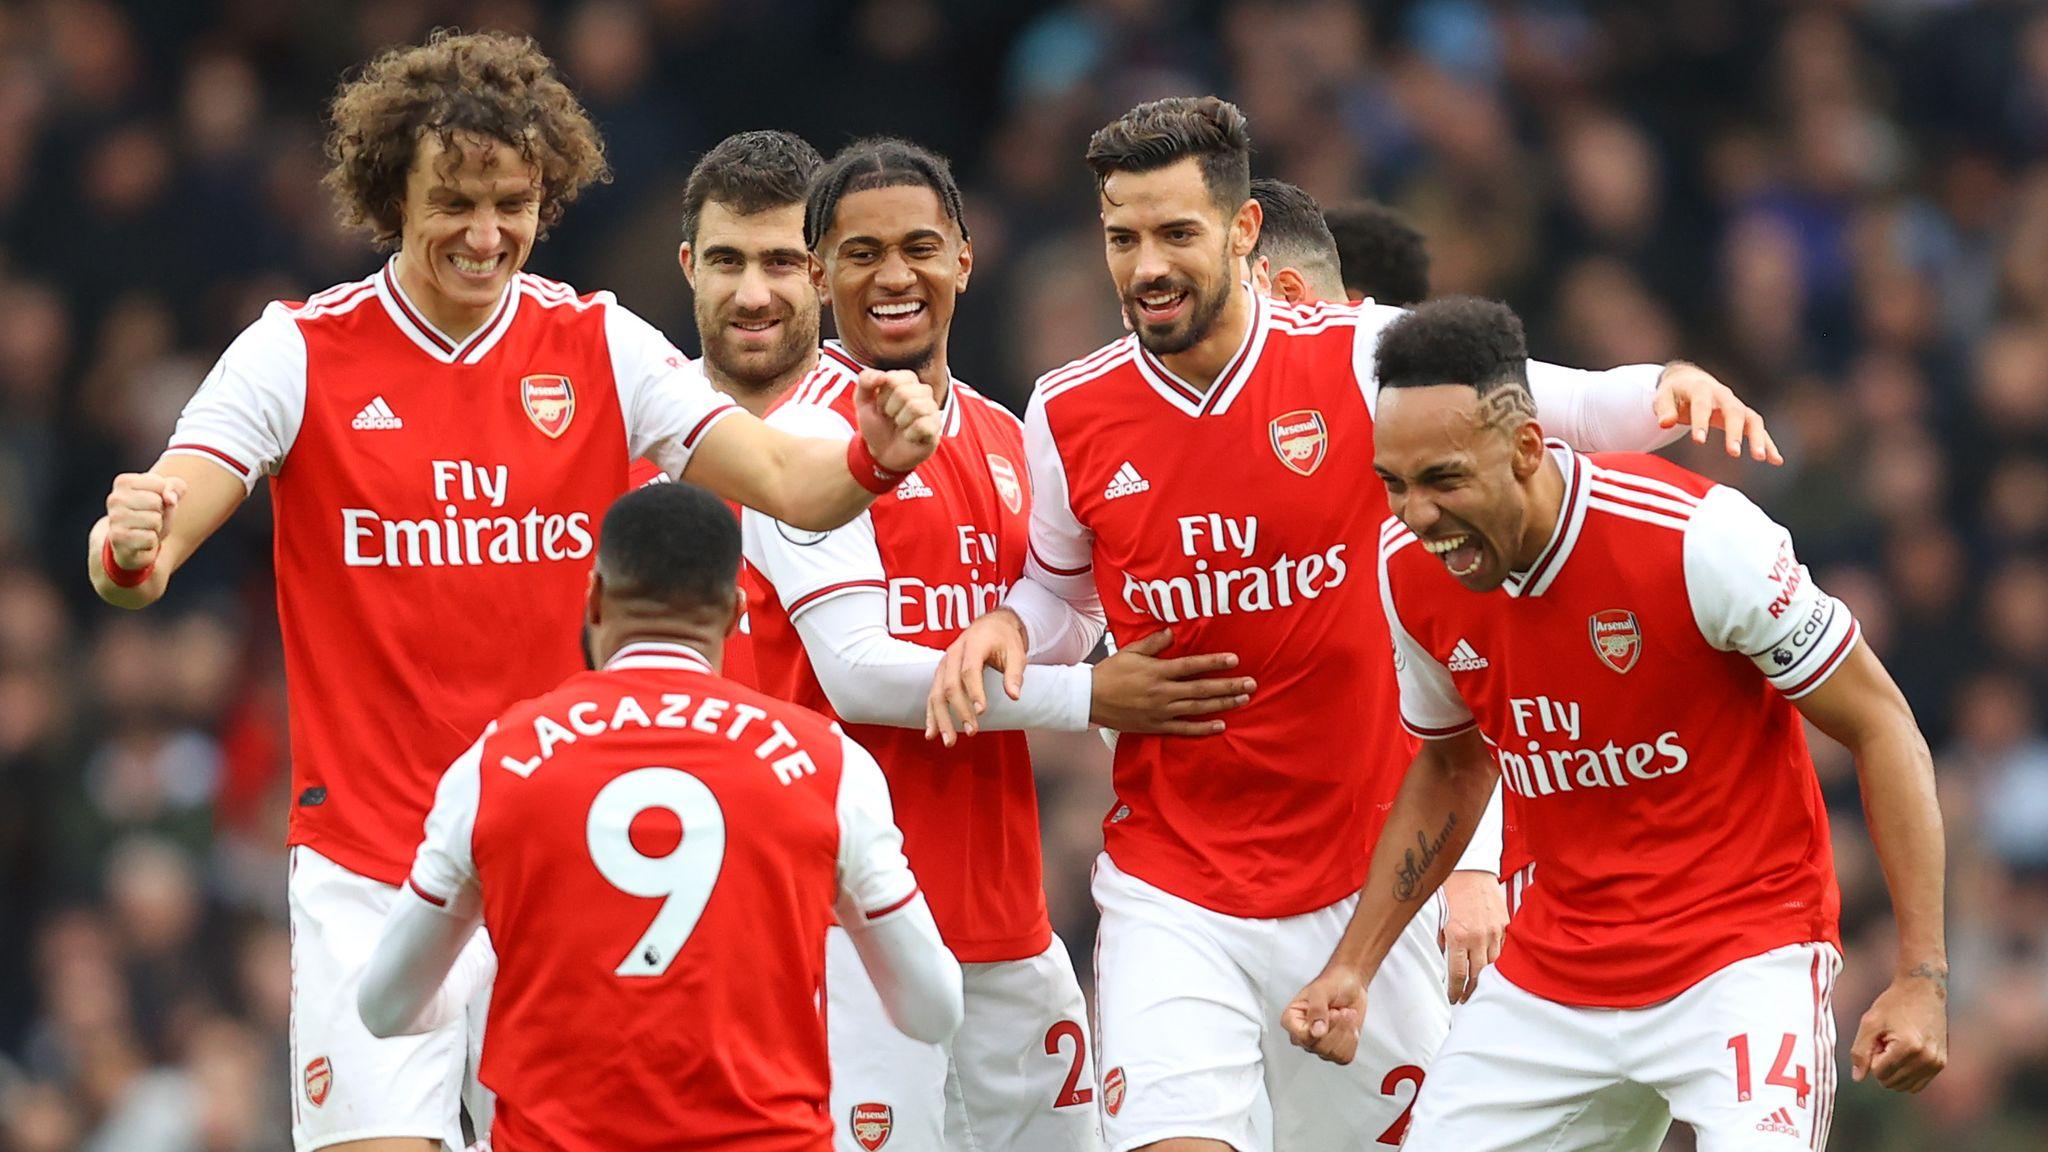 Arsenal 3 Tottenham 1: Gunners Hit Hotspurs at Emirates